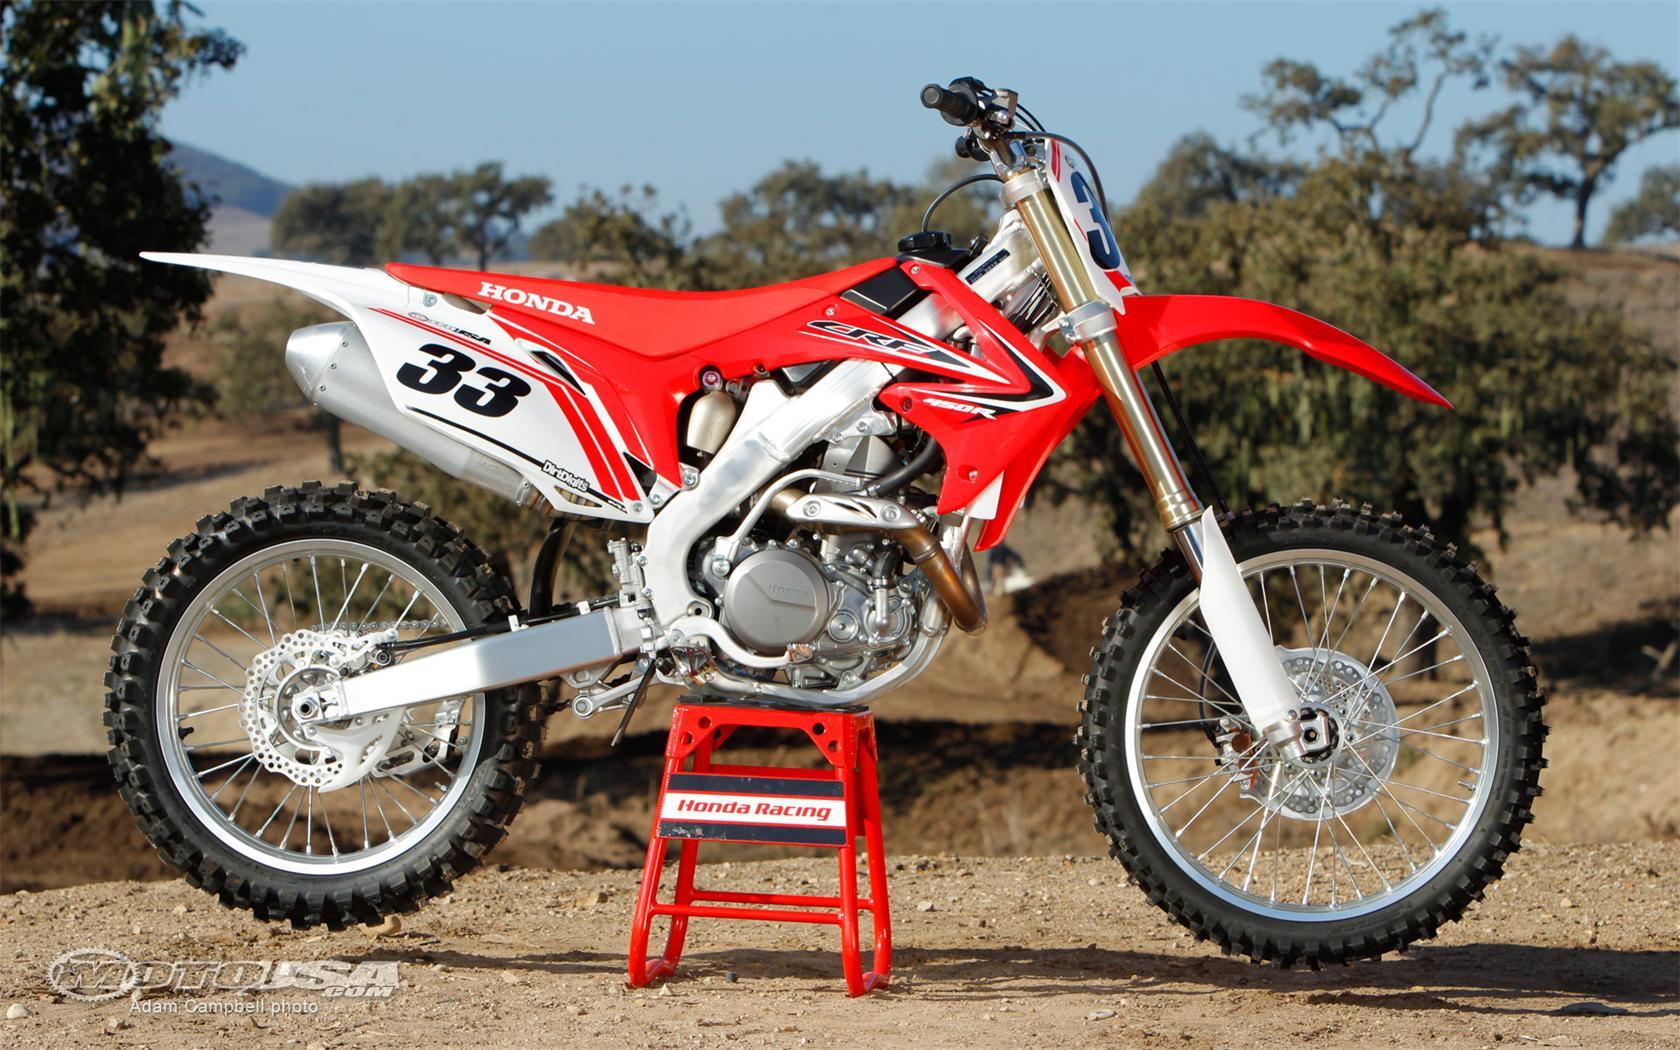 Motocross Honda Dirt Bike Wallpaper HD 10 Motorcycle High Resolution 1680x1050